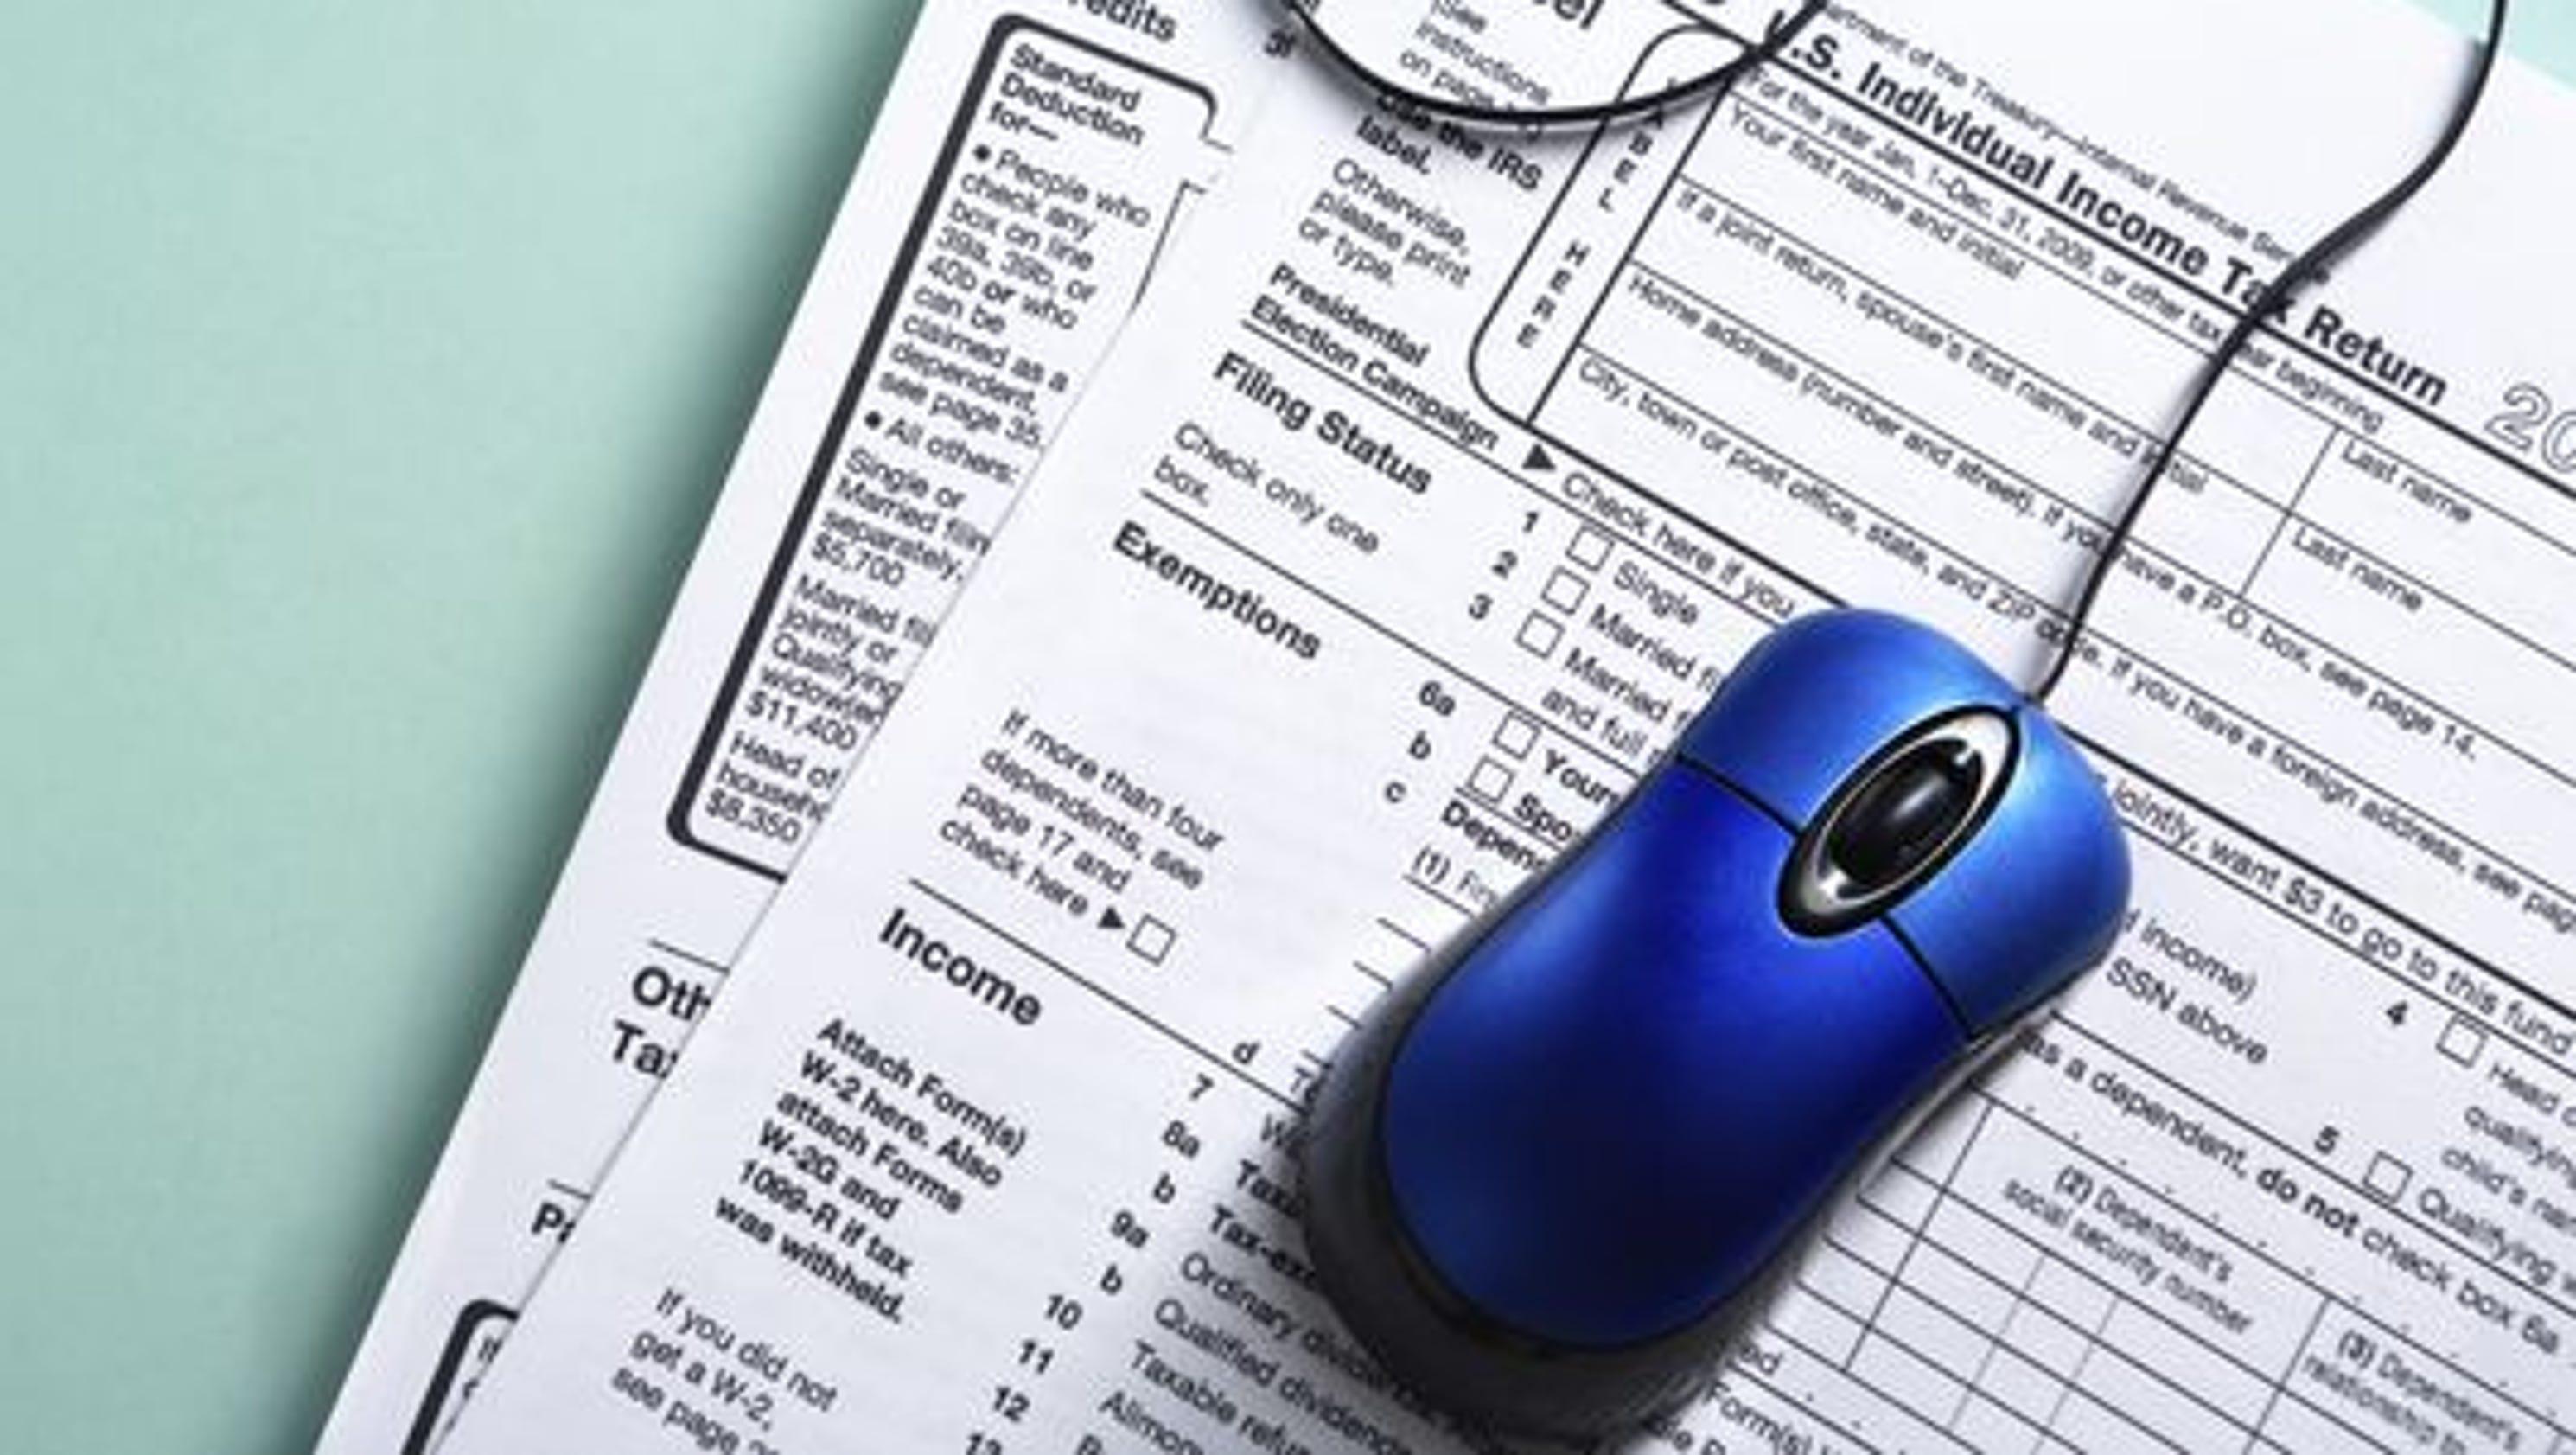 ed full form in tax